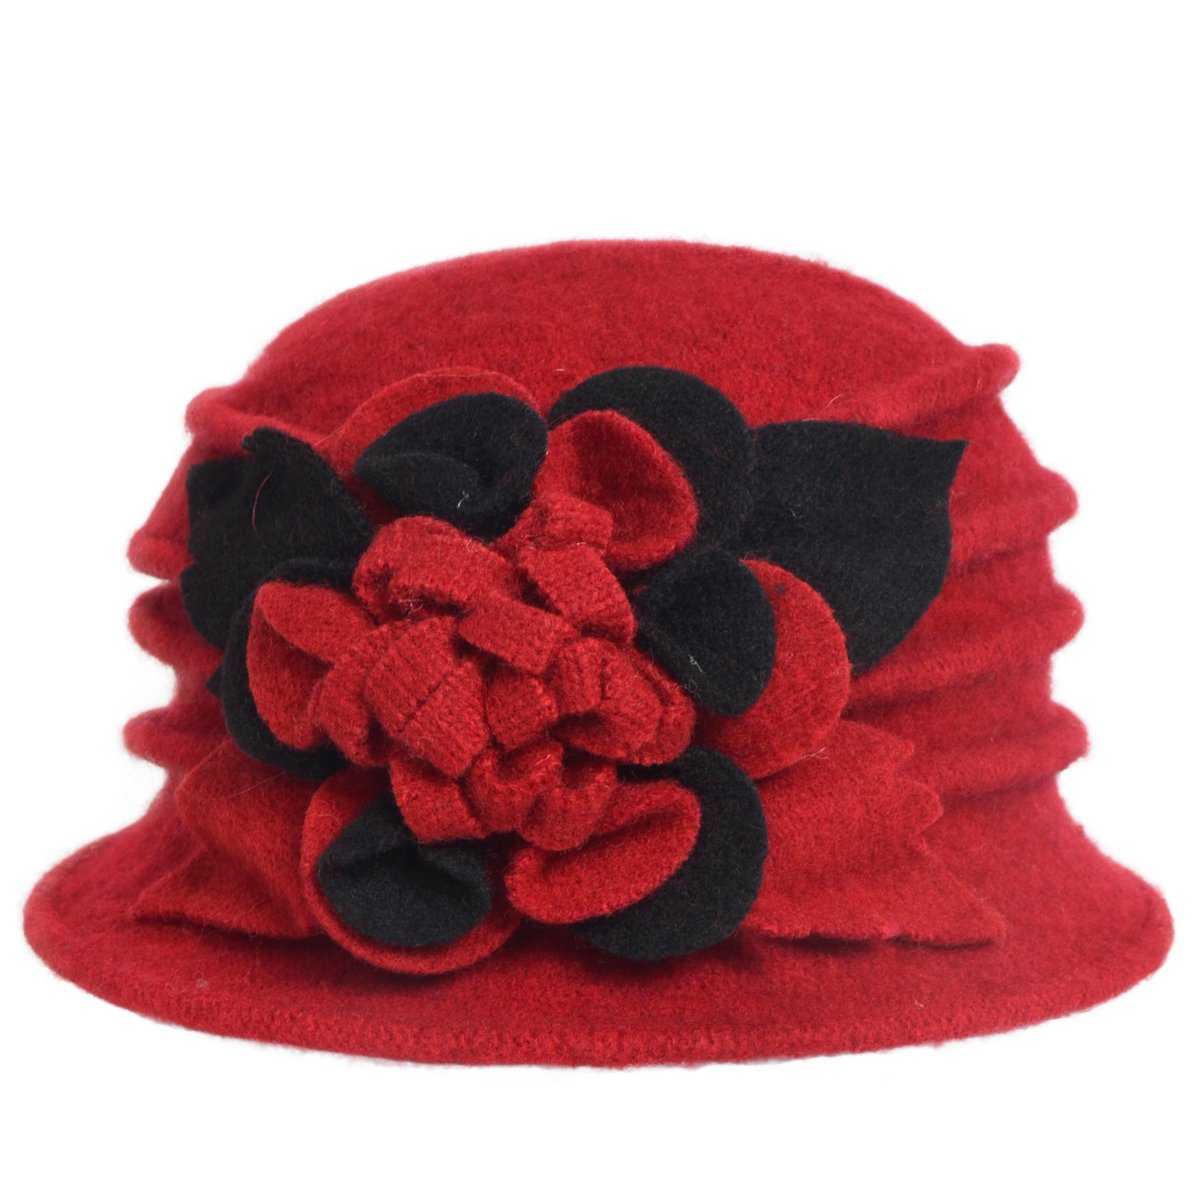 HISSHE Lady Wool Floral Bucket Cloche Bowler Hat Felt Dress Hat C030